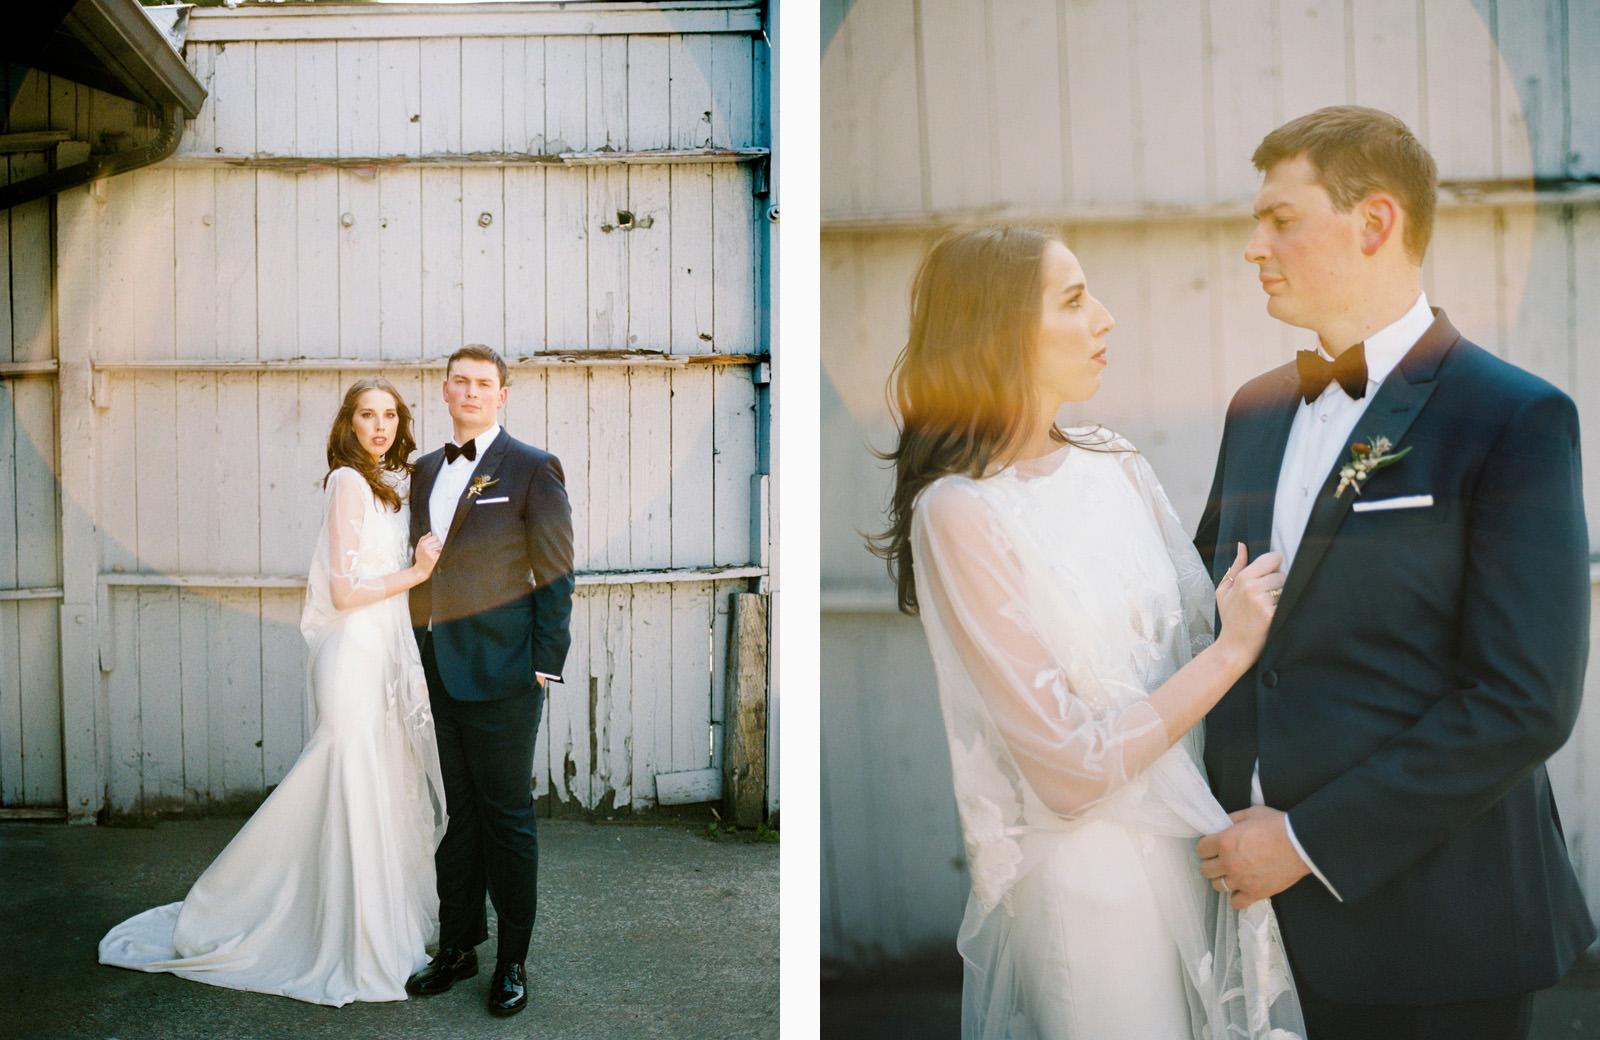 sodo-park-wedding-055 SODO PARK WEDDING